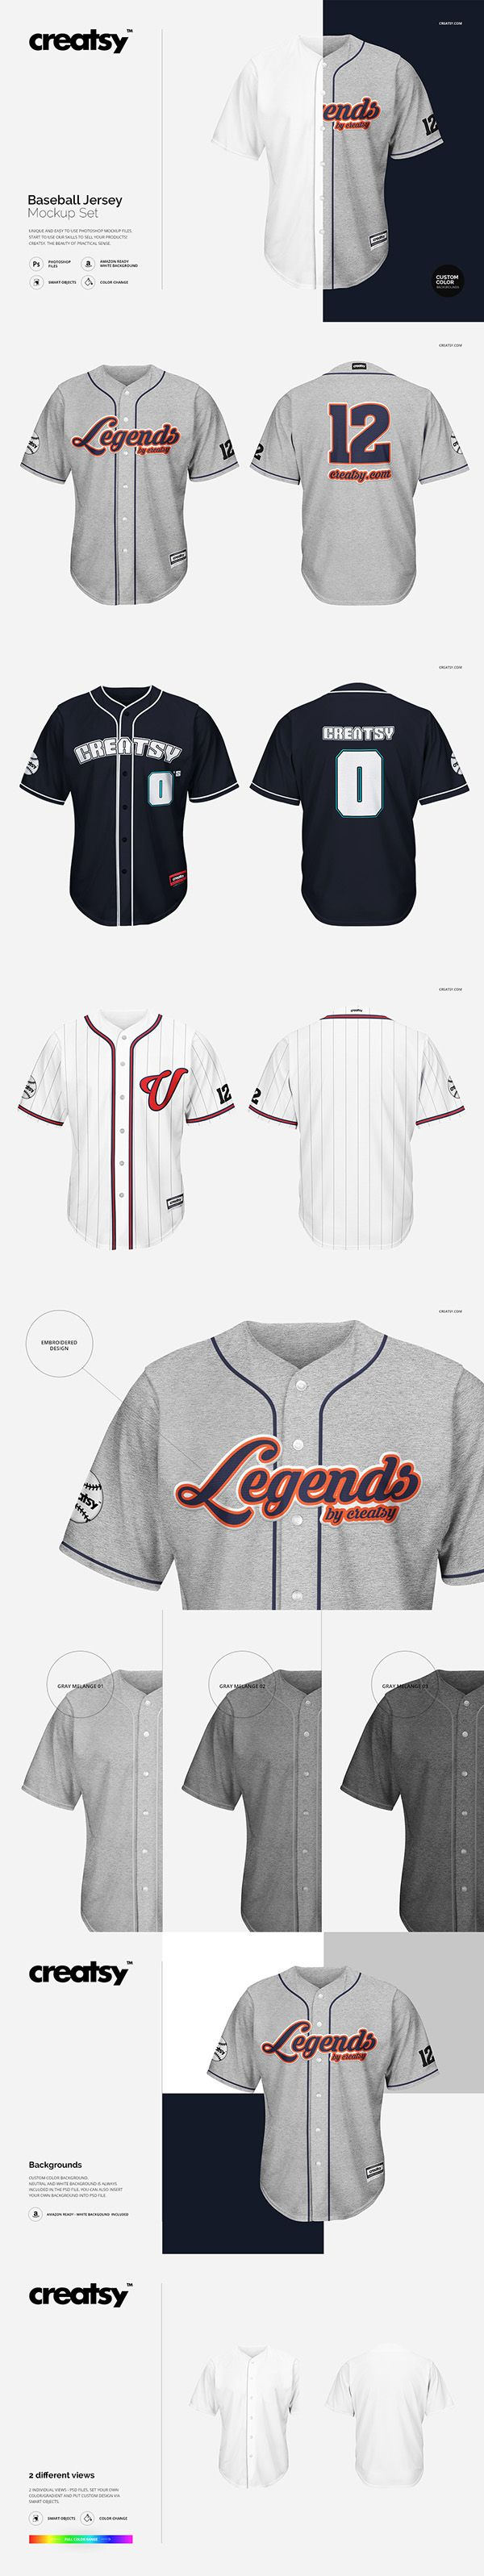 Download Baseball Jersey Mockup Set On Behance Baseball Jerseys Baseball Jersey